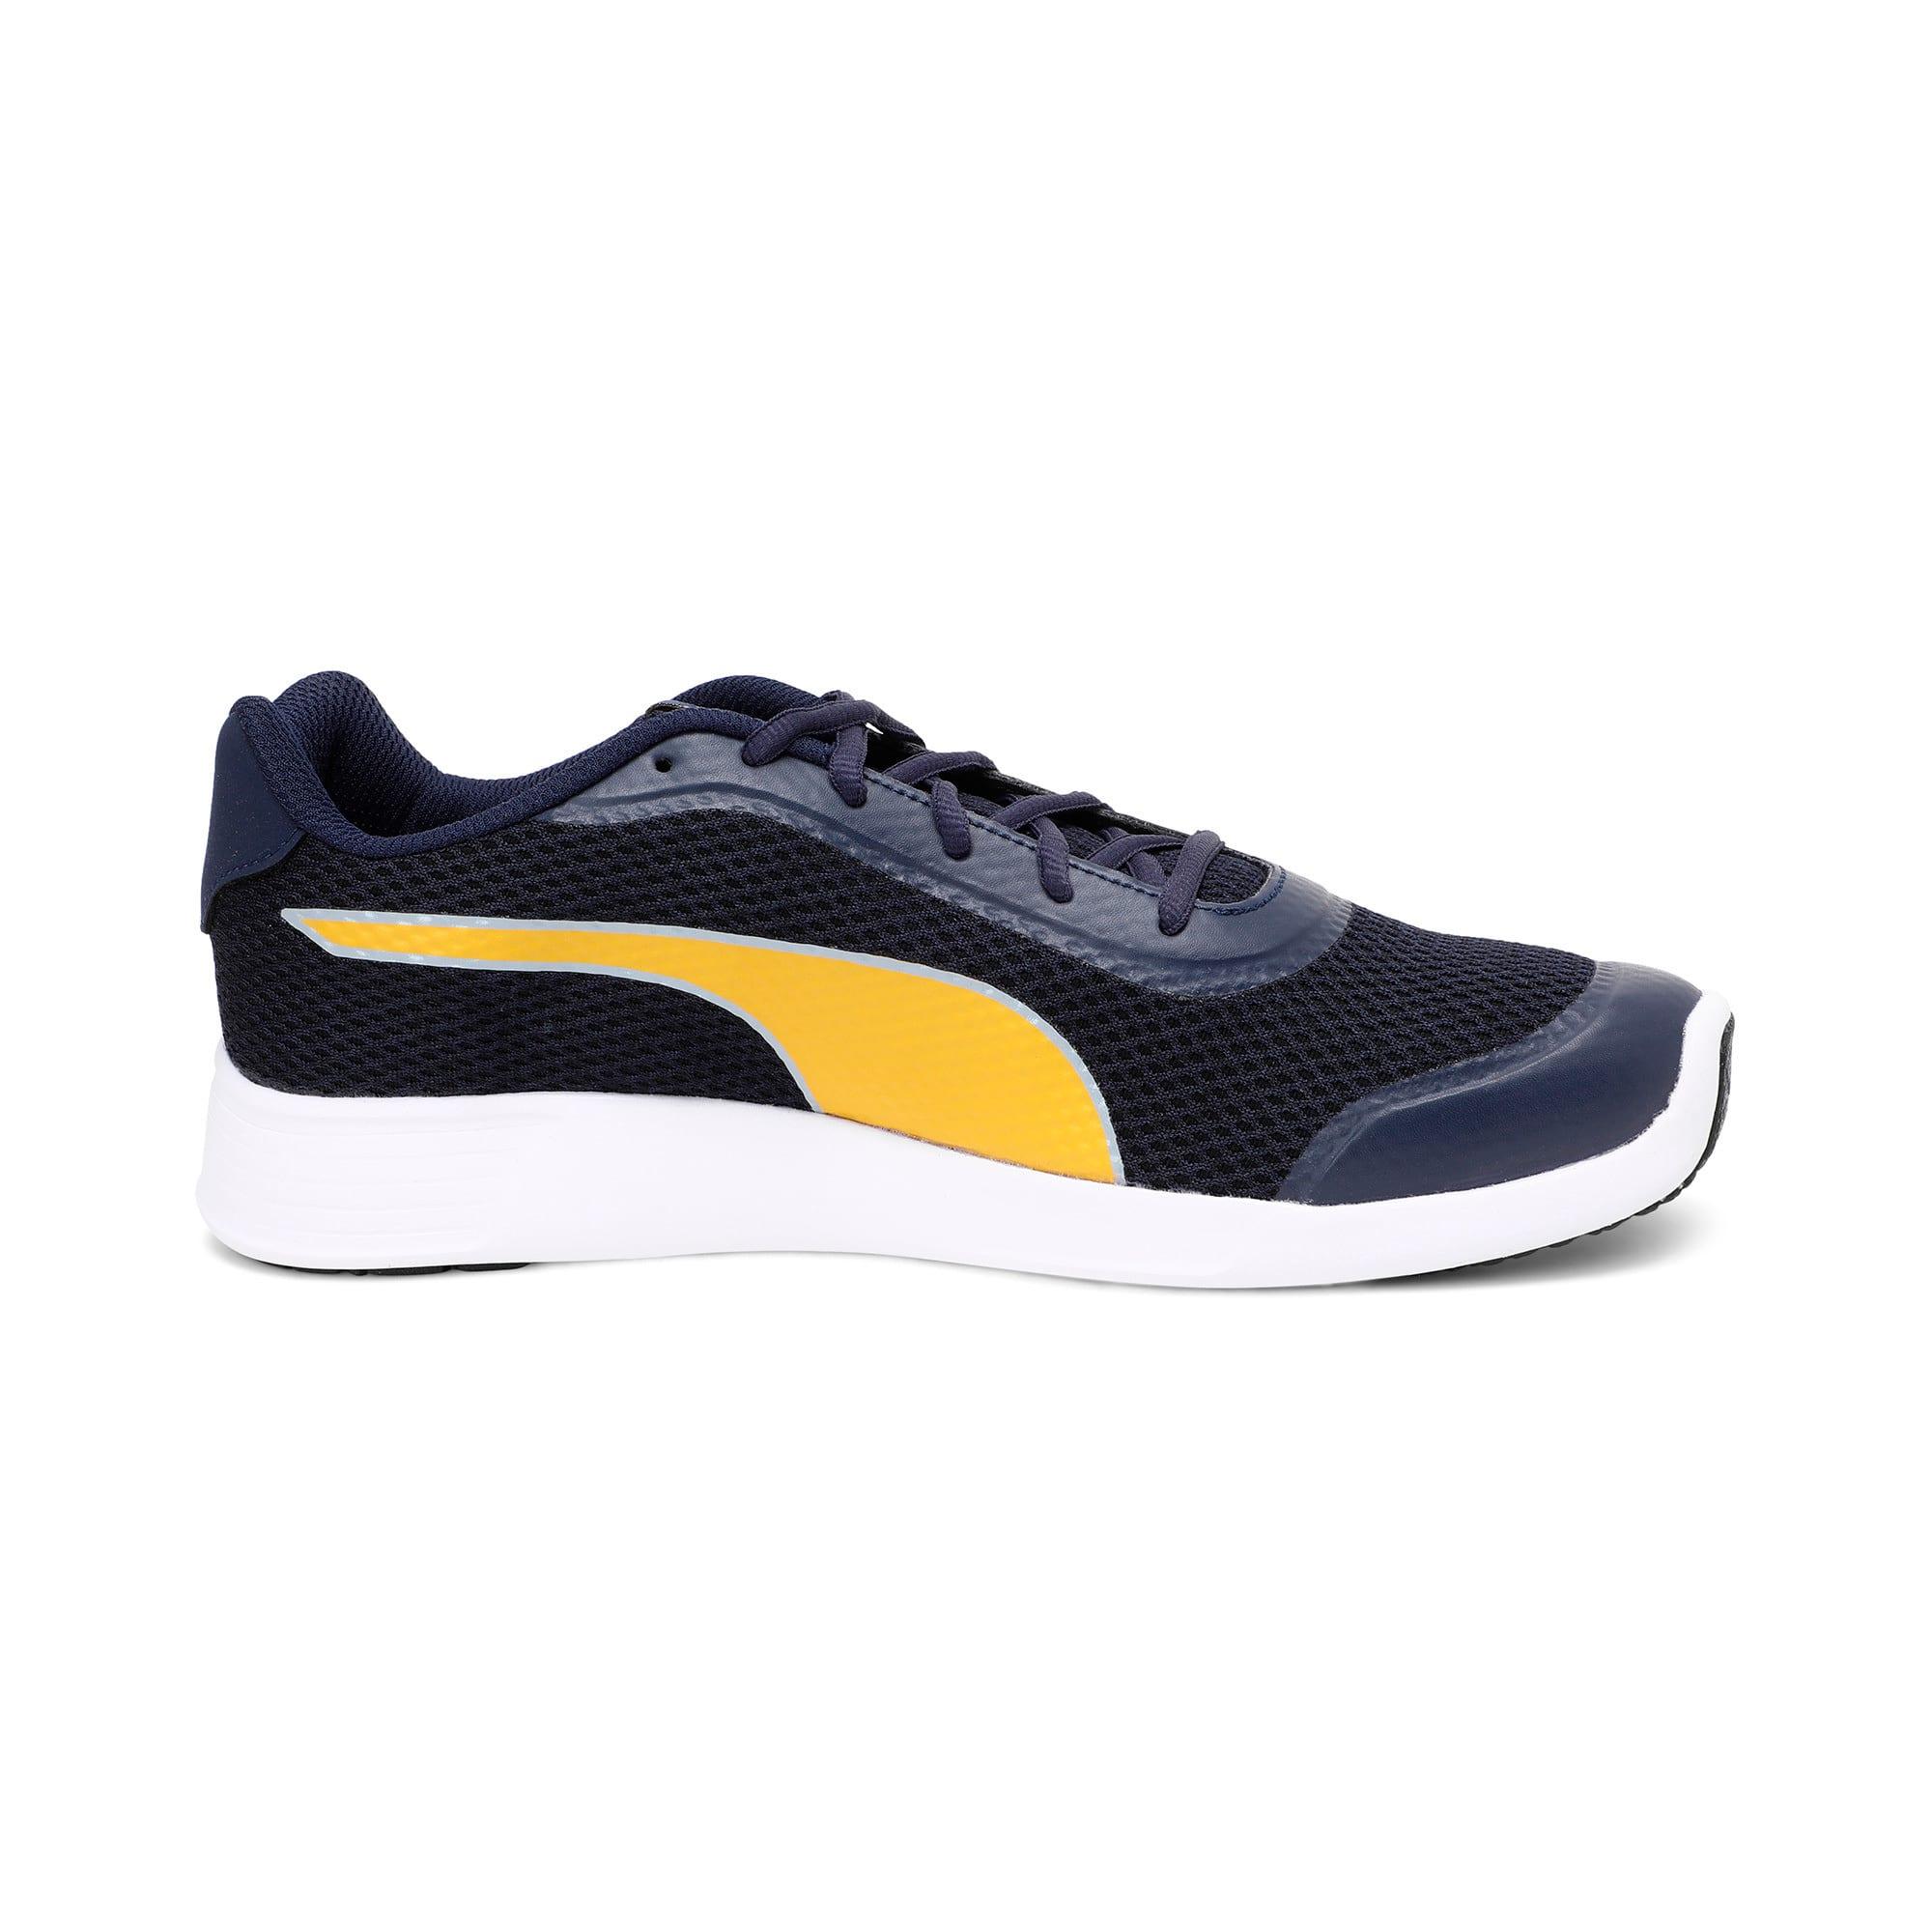 Thumbnail 5 of FST Runner v2 IDP Men's Sportstyle Shoes, Dark Shadow-Silver-Quarry, medium-IND